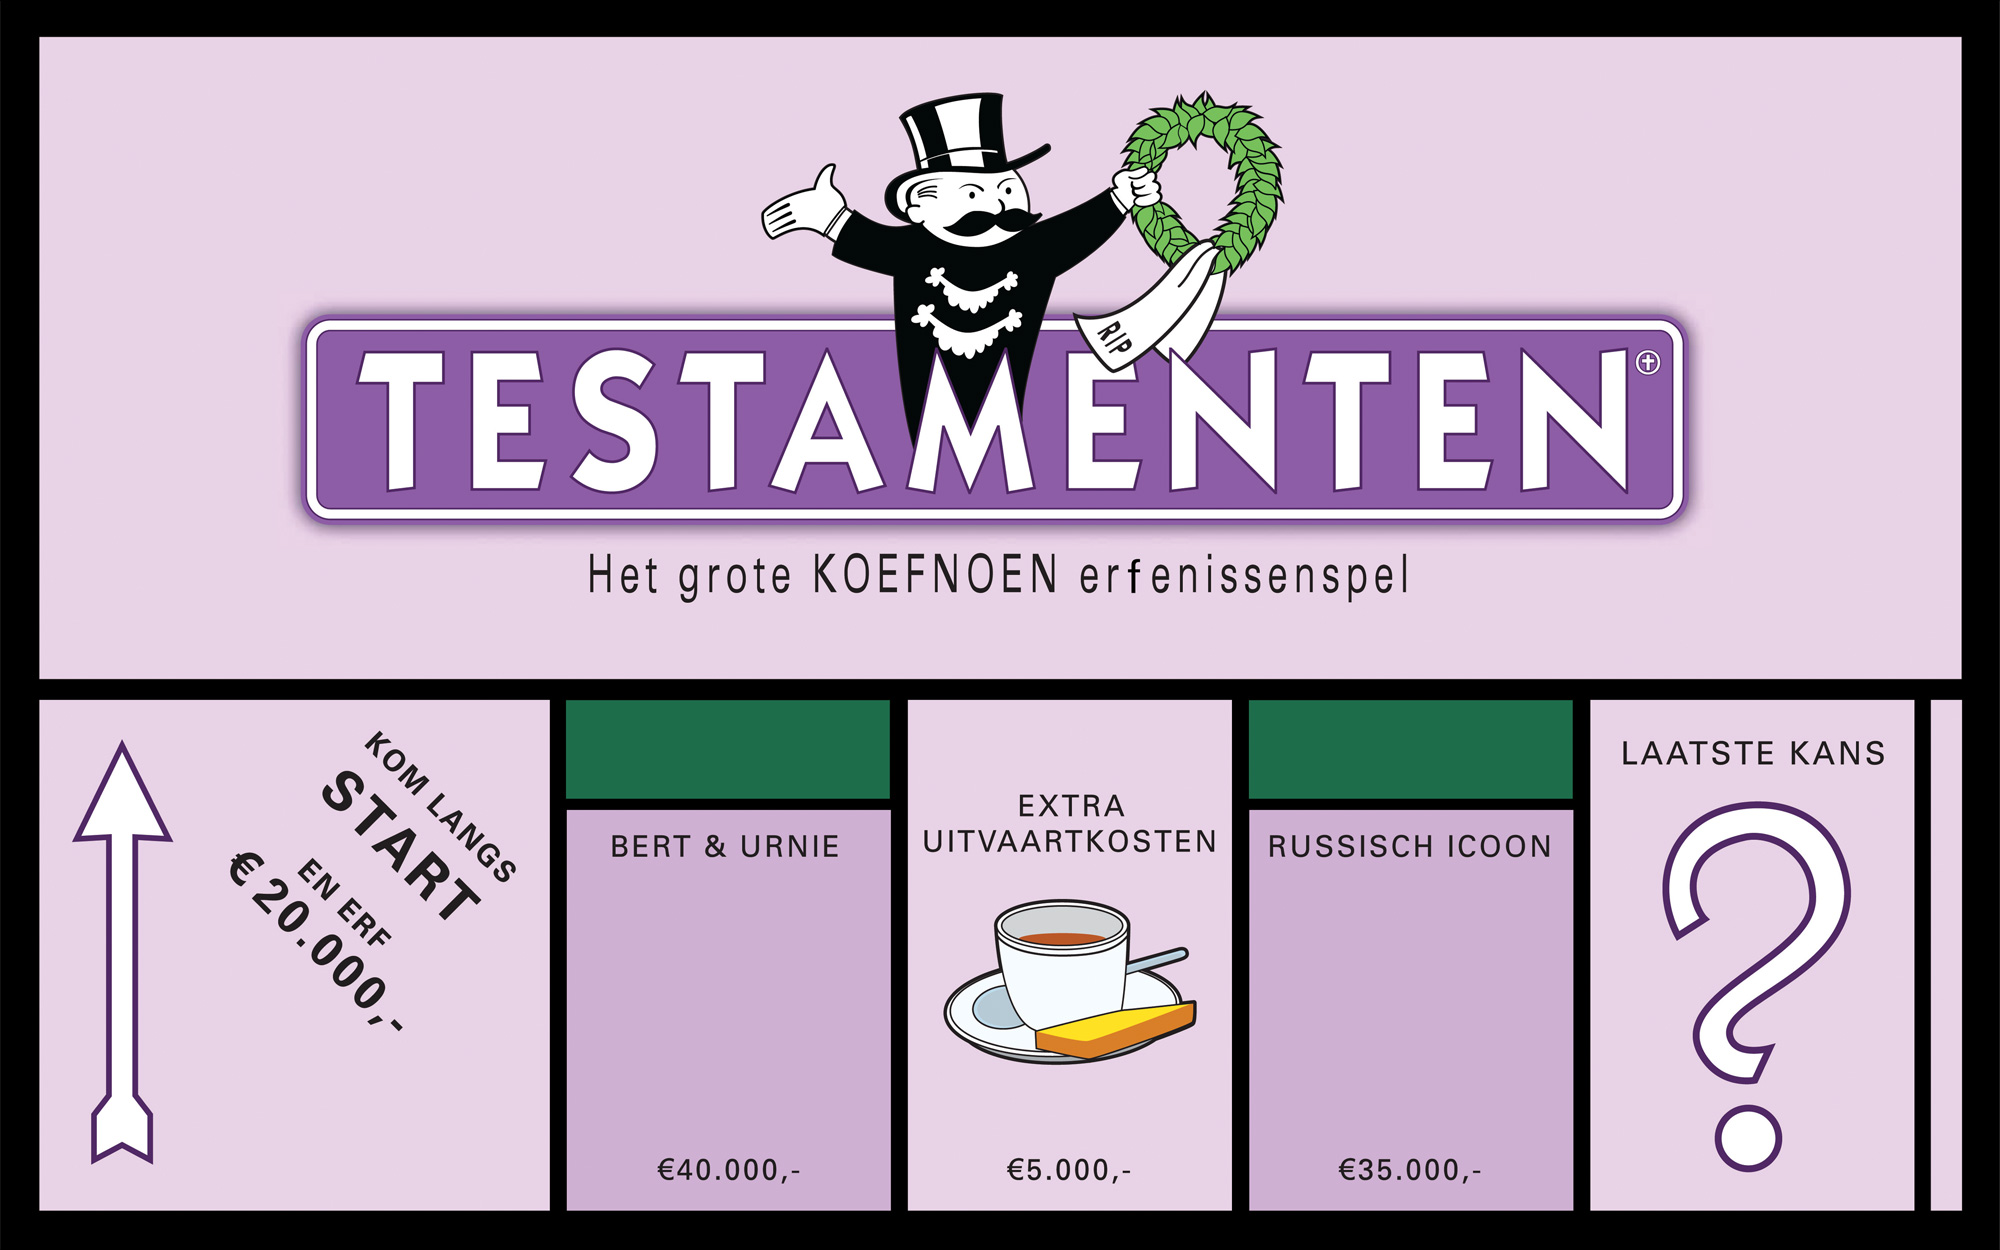 Boardgame prop box: Game of inheritance - Testamentenspel